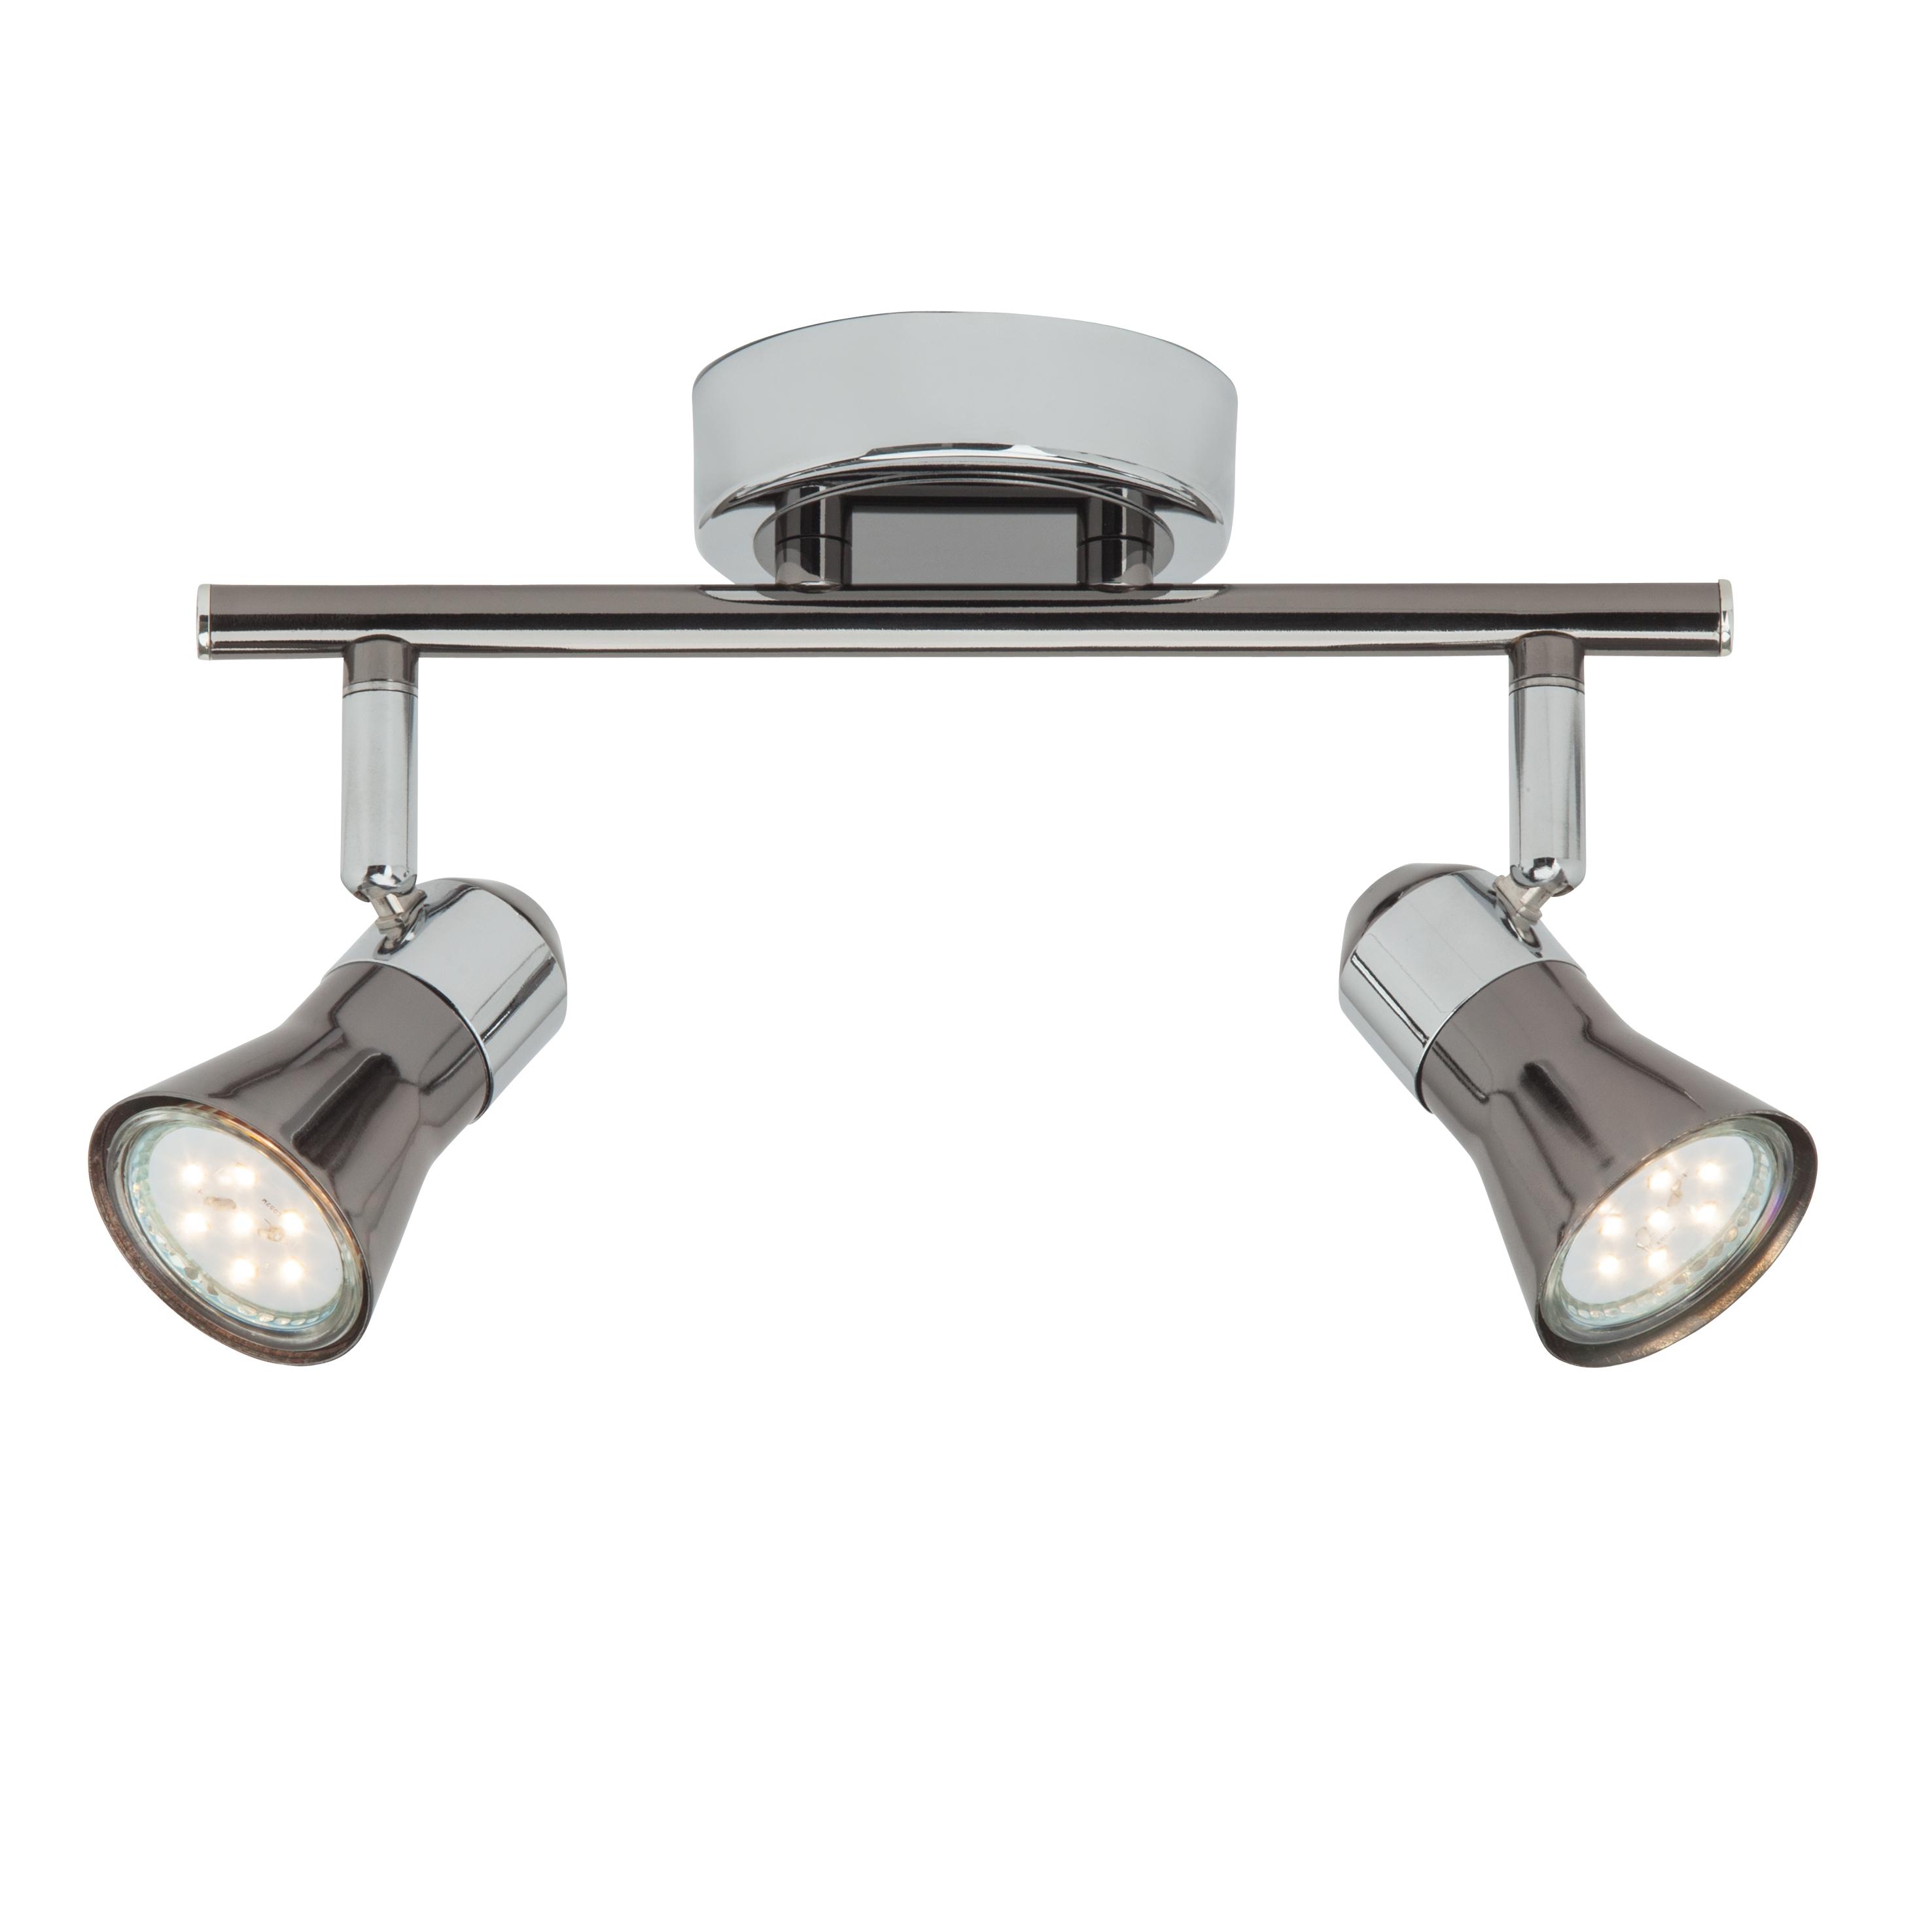 Brilliant Leuchten Jupp LED Spotrohr 2flg chrom/schwarz